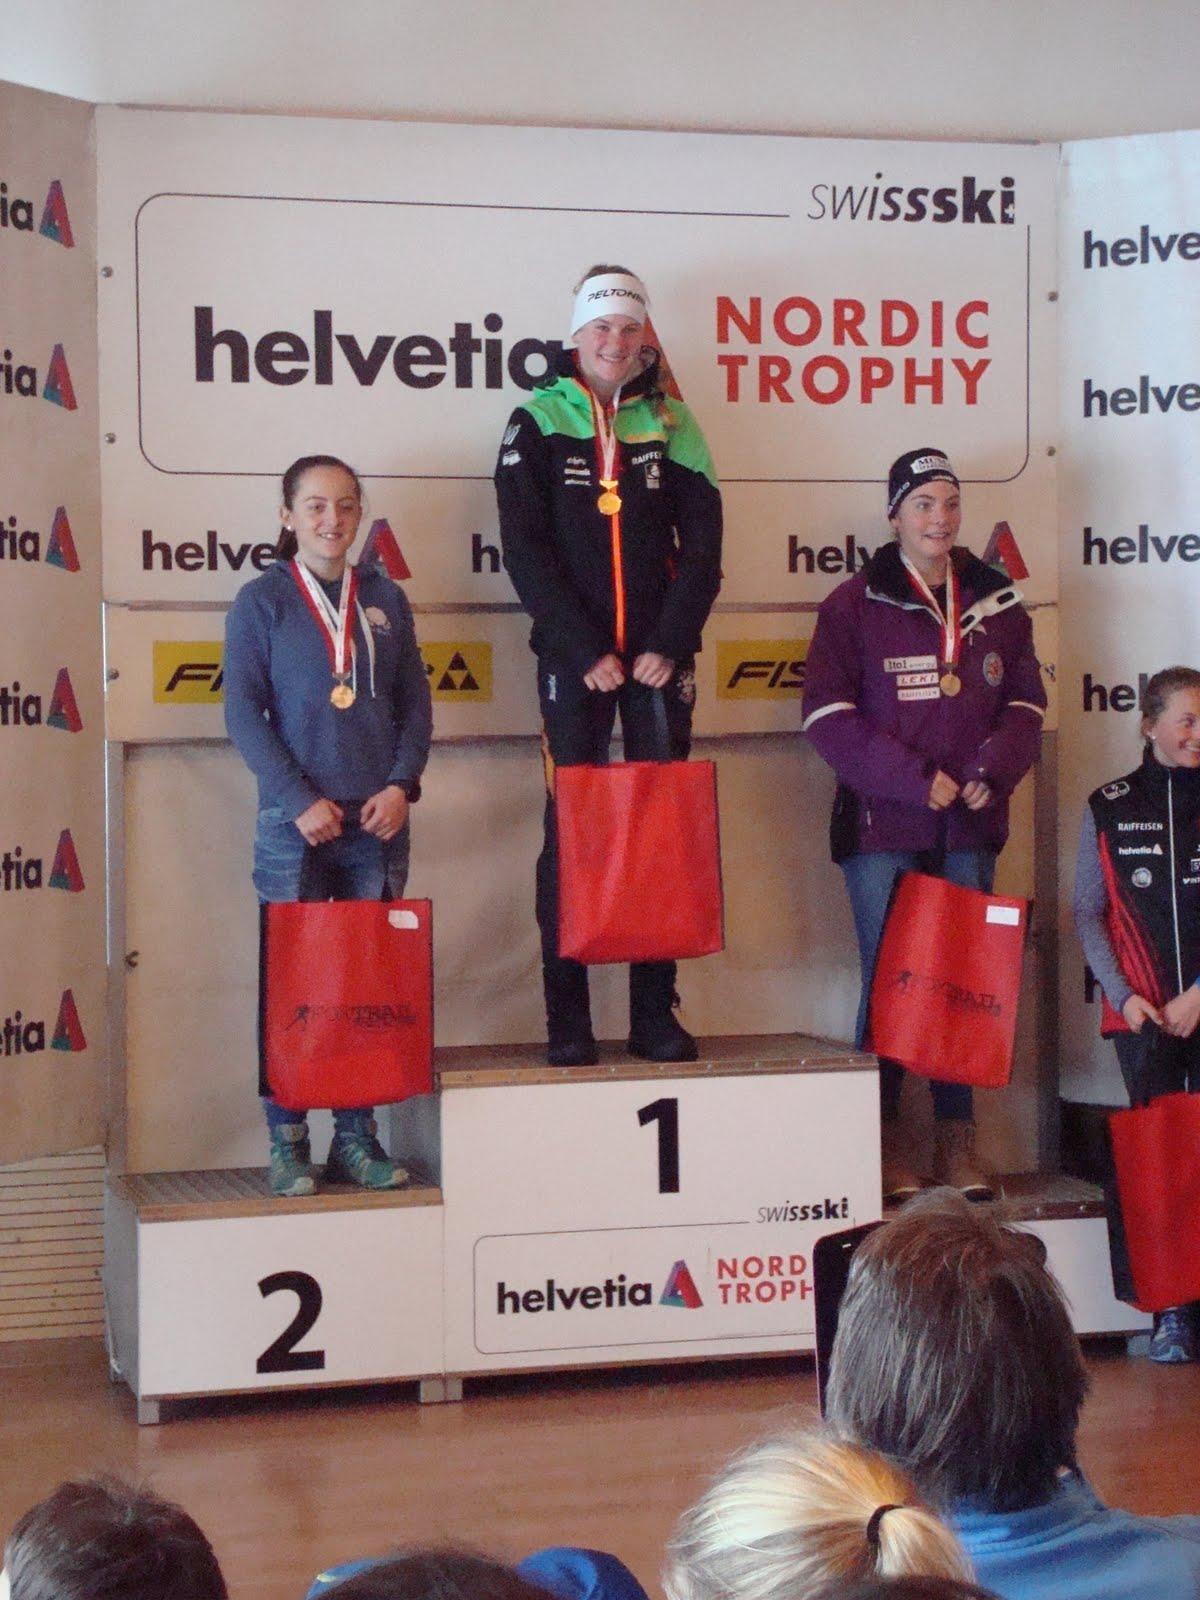 2016-01-10 Helvetia Nordic Trophy - Col des Mosses